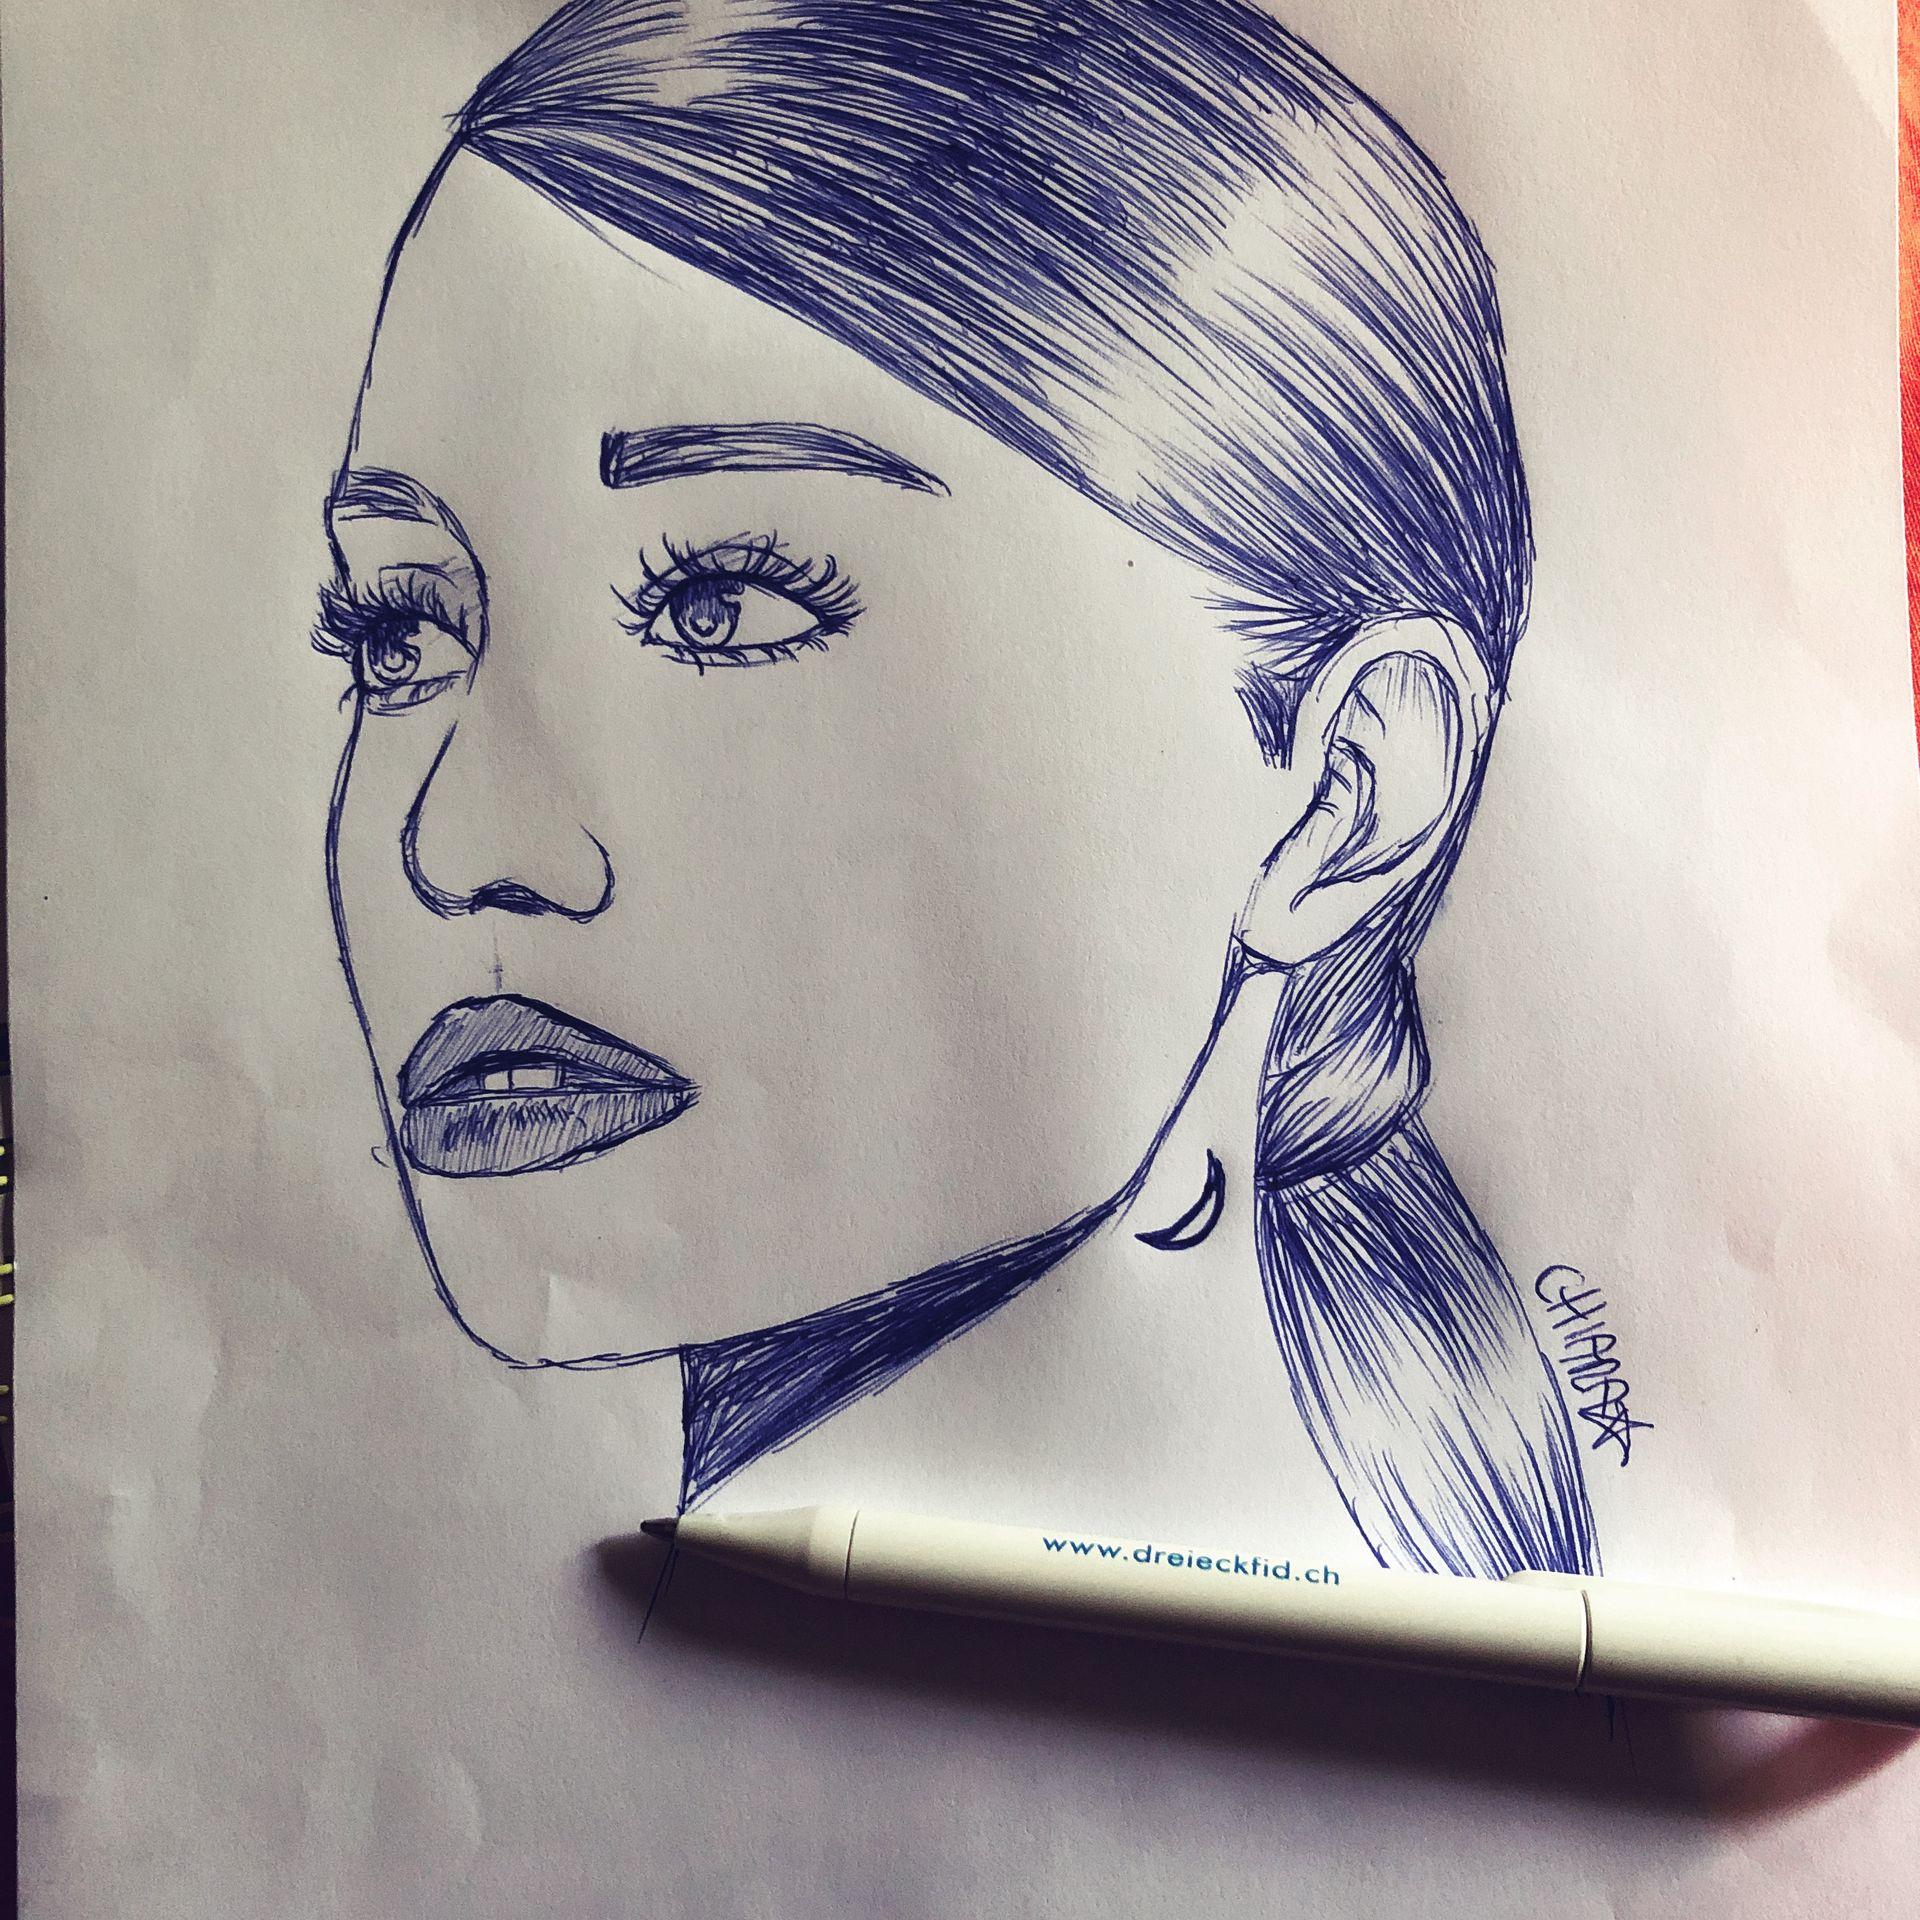 I Miei Disegni Pt 2 Ariana Grande Wattpad